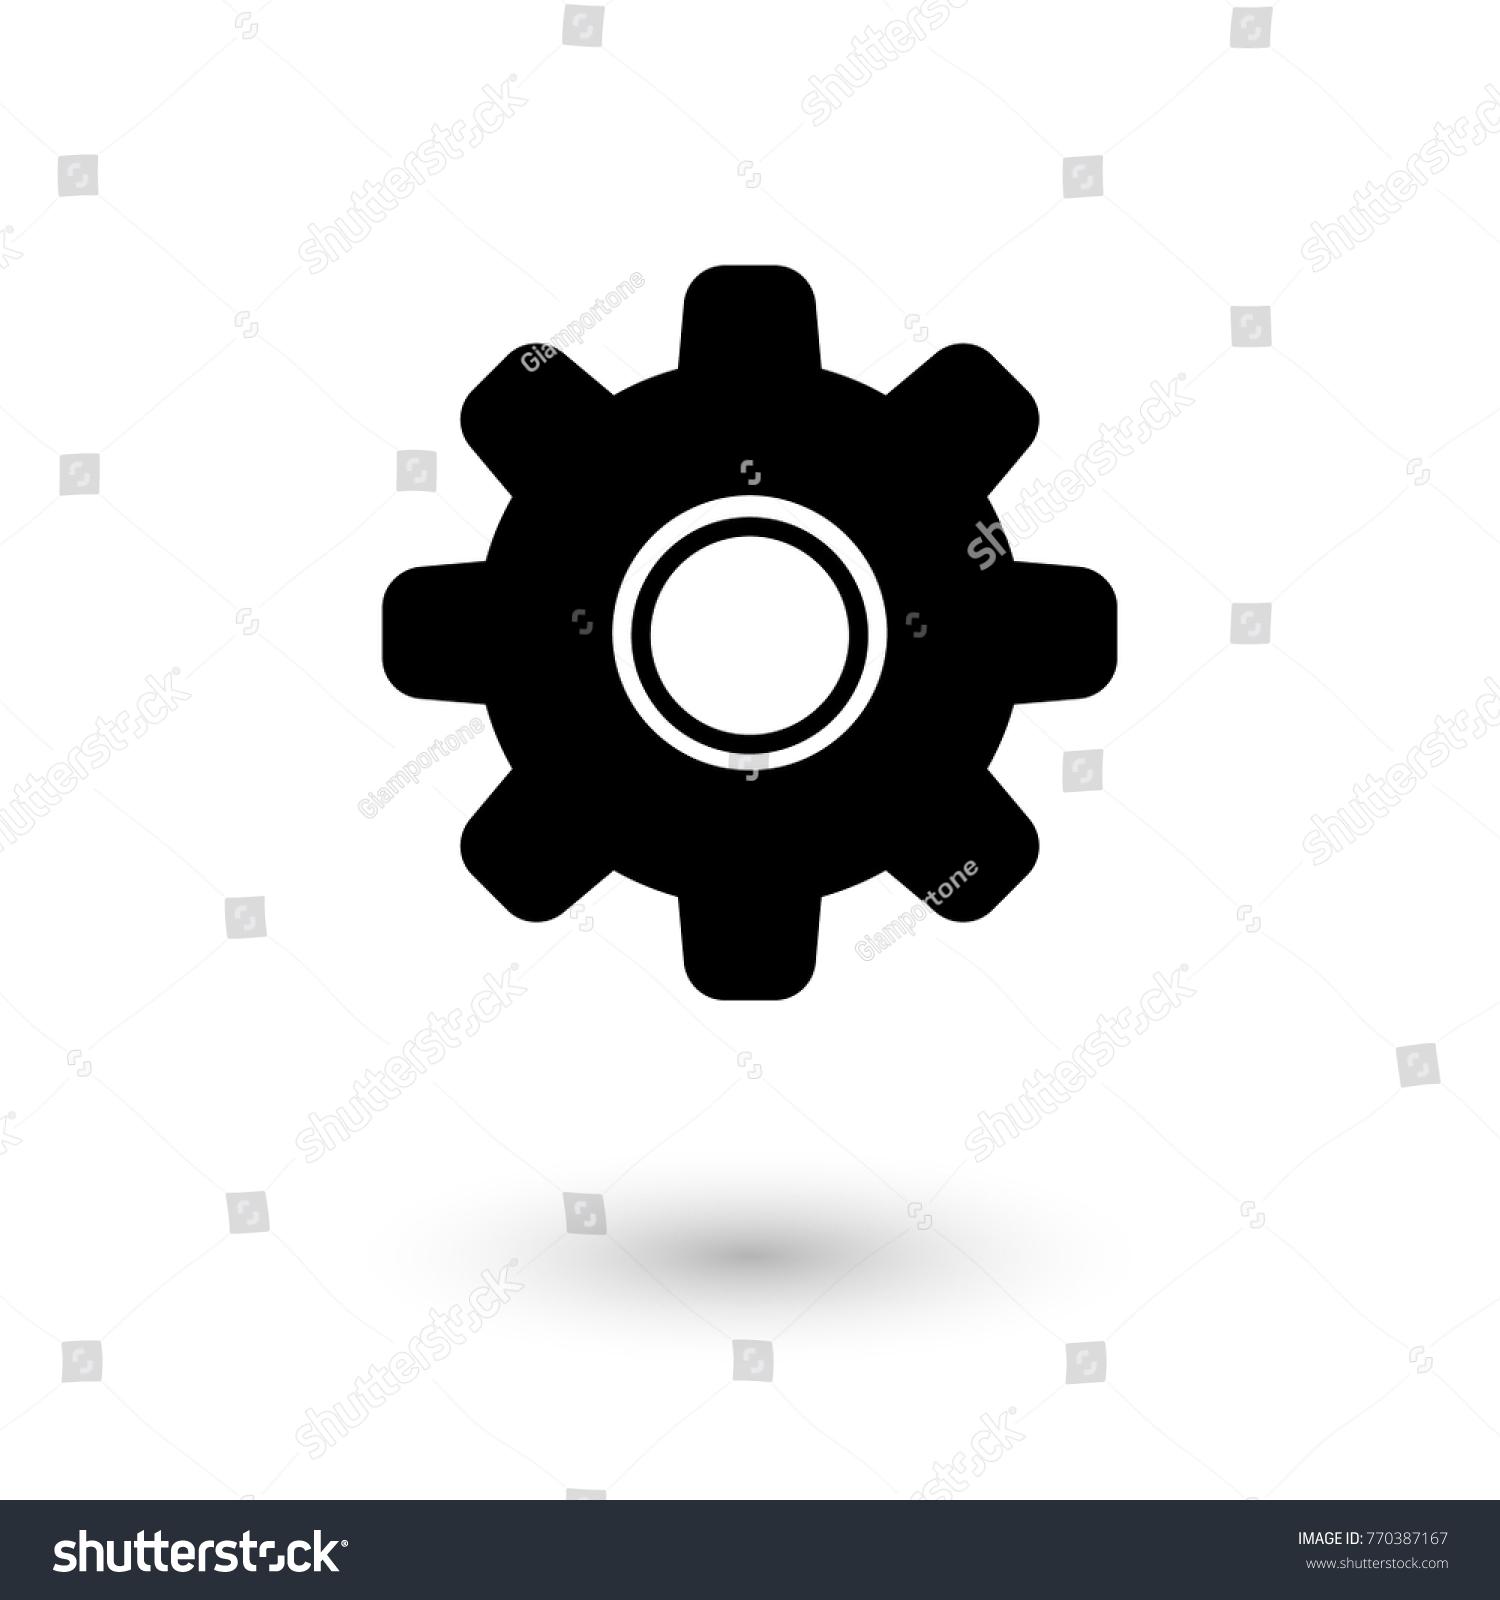 Symbol for work photo